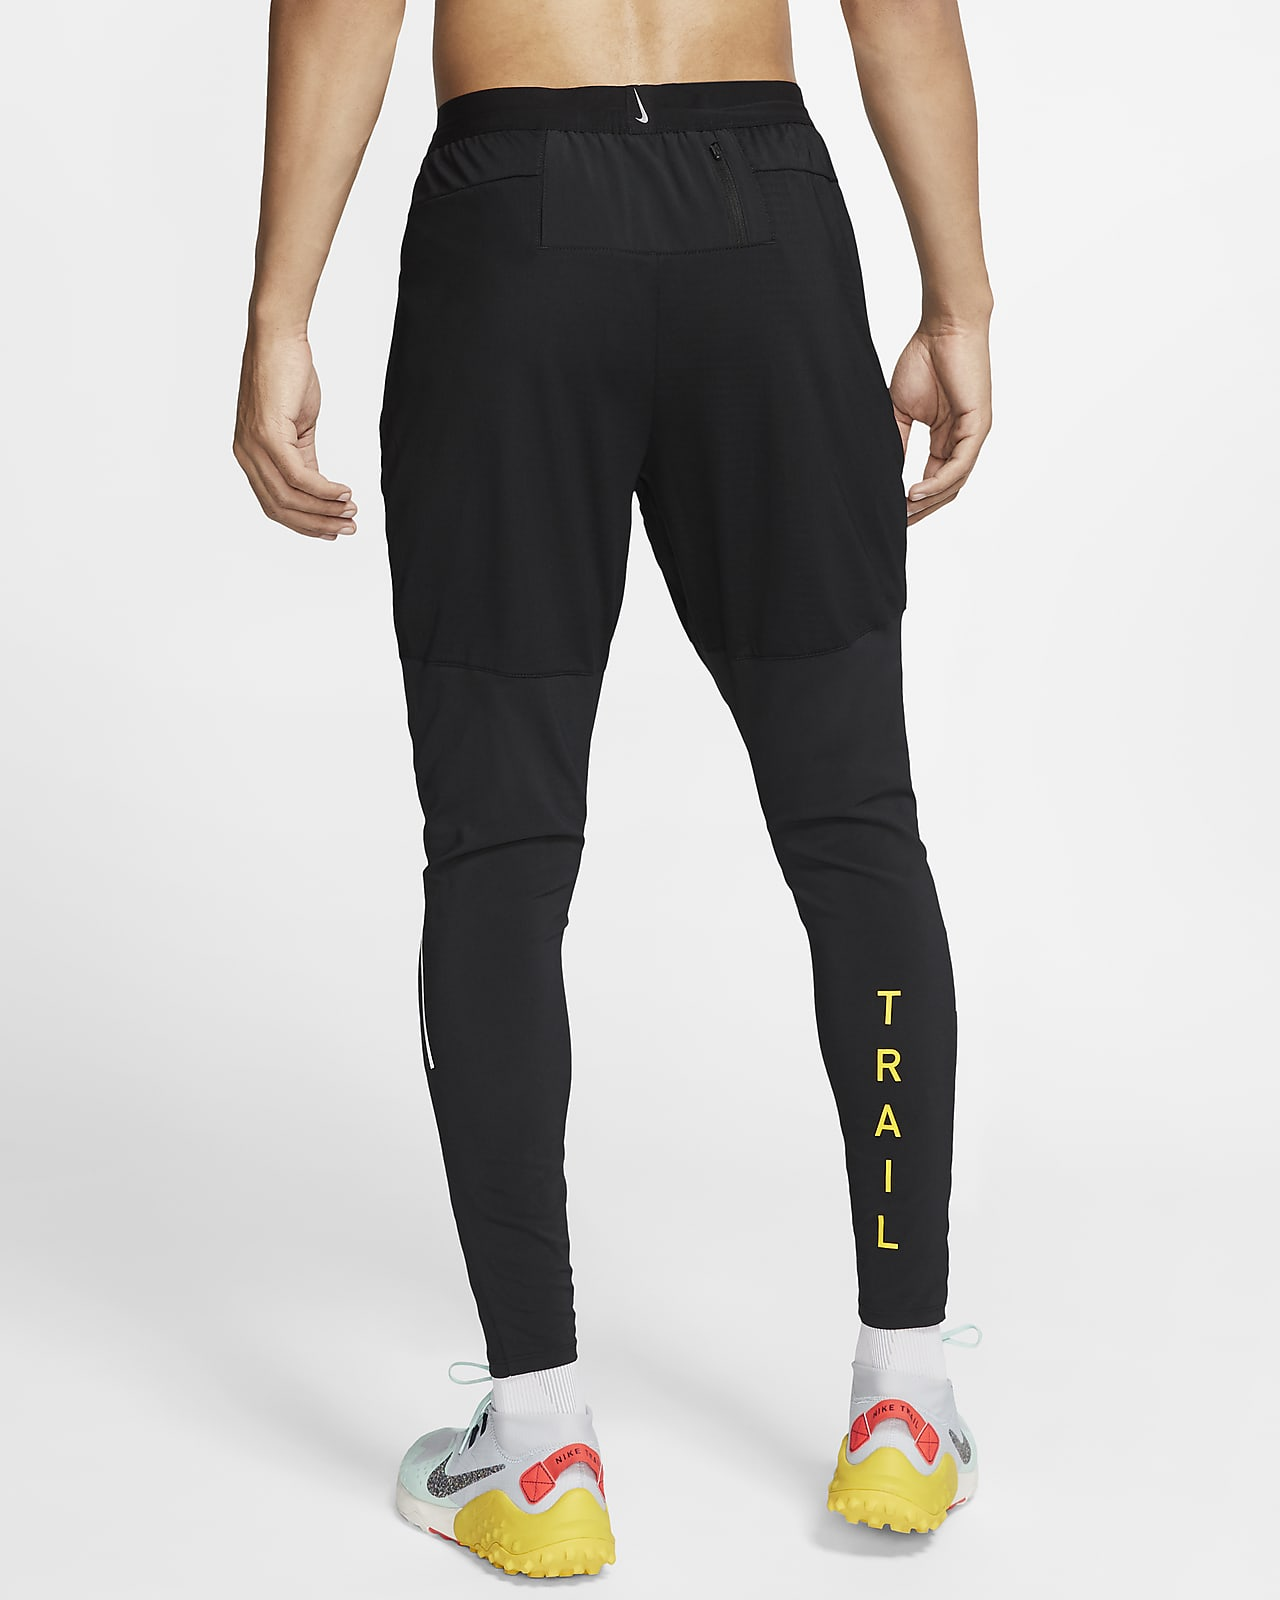 Gobierno Belicoso Tormento Pantalon Largo Running Hombre Nike Happilyhomeschooling Com